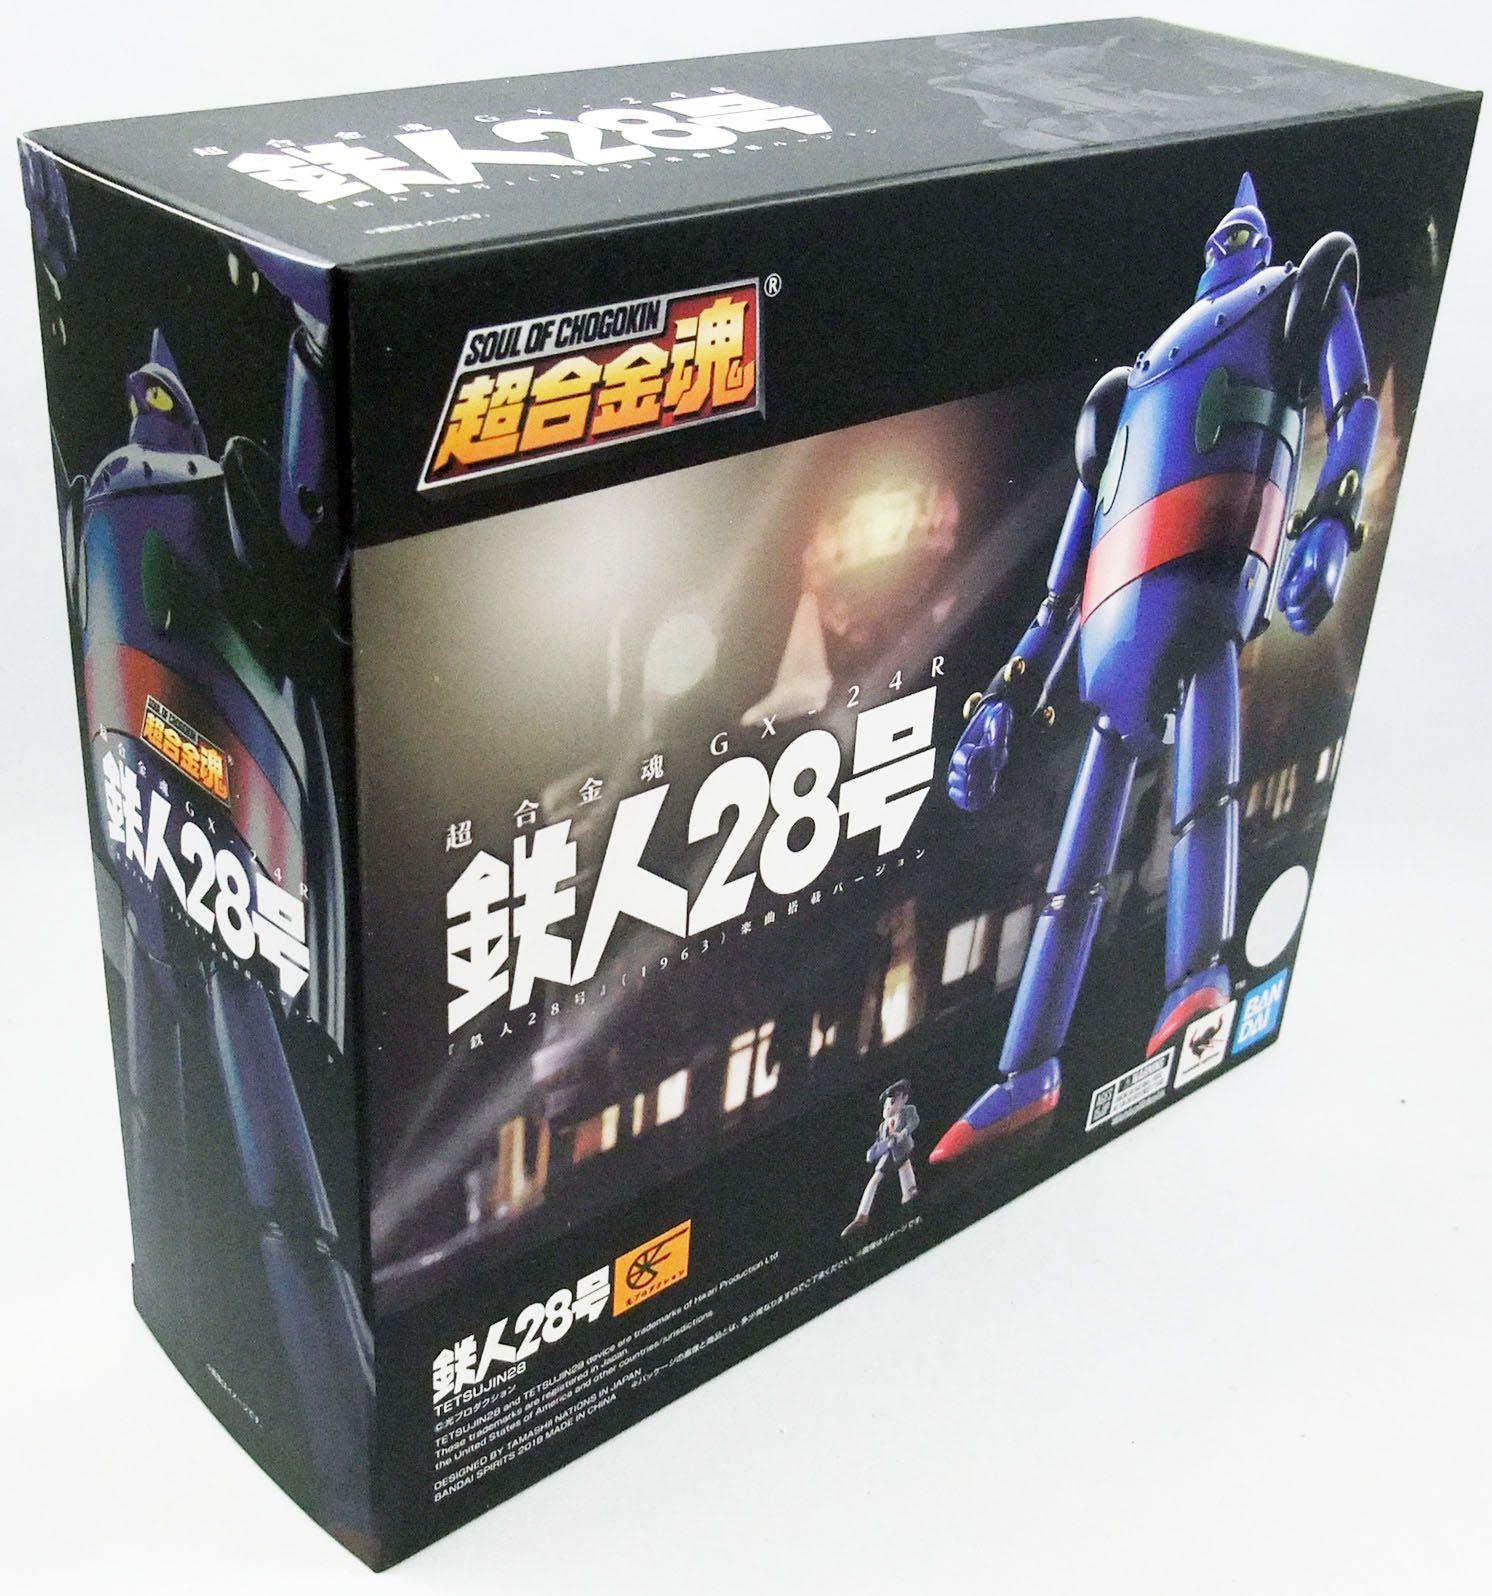 Tetsujin 28 - Bandai Soul of Chogokin GX-24R - Super Robot 28 Gigantor